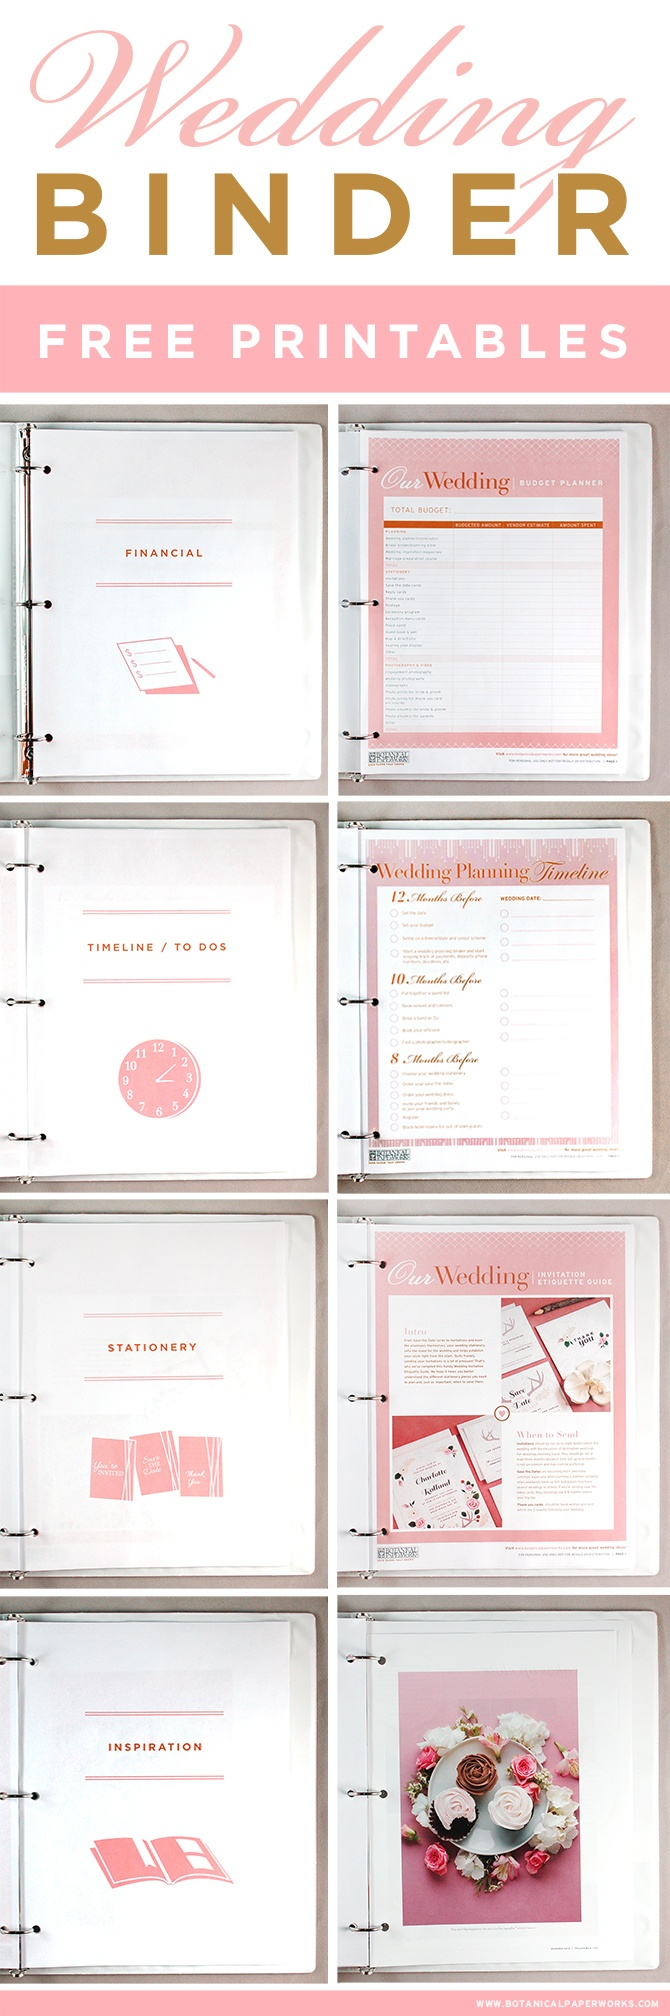 Free Printable Wedding Planning Worksheets | Shop Fresh - Free Printable Wedding Organizer Templates